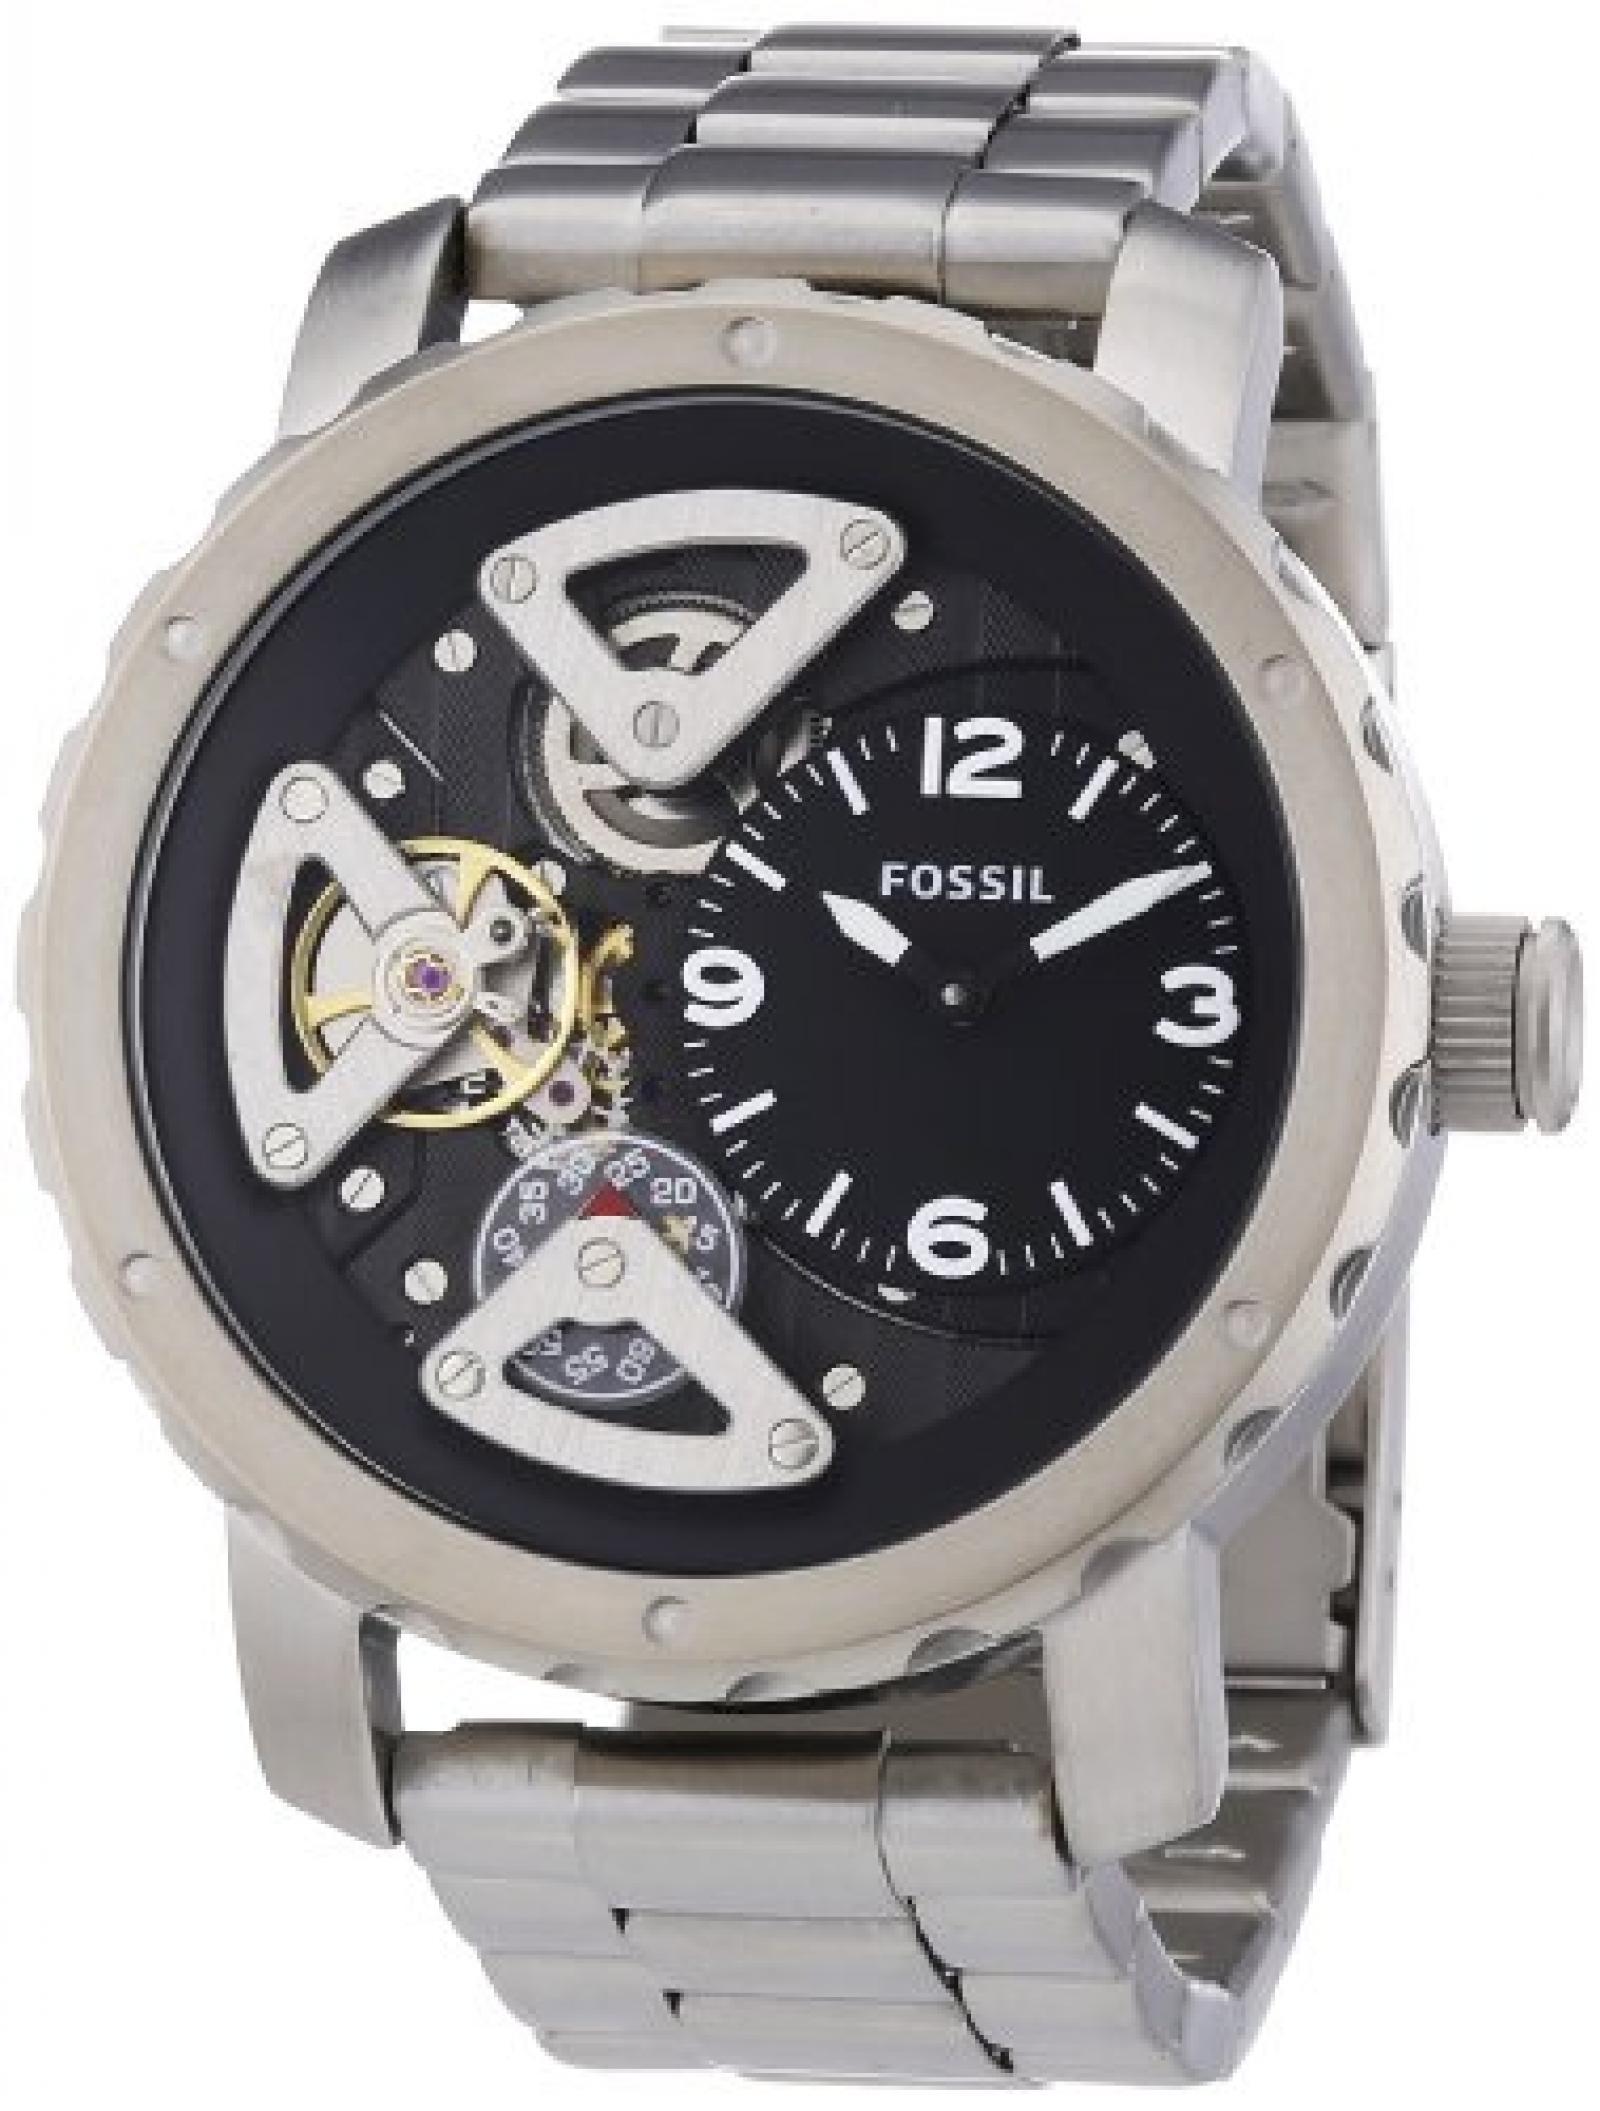 Fossil Herren-Armbanduhr XL Analog Quarz Edelstahl ME1132